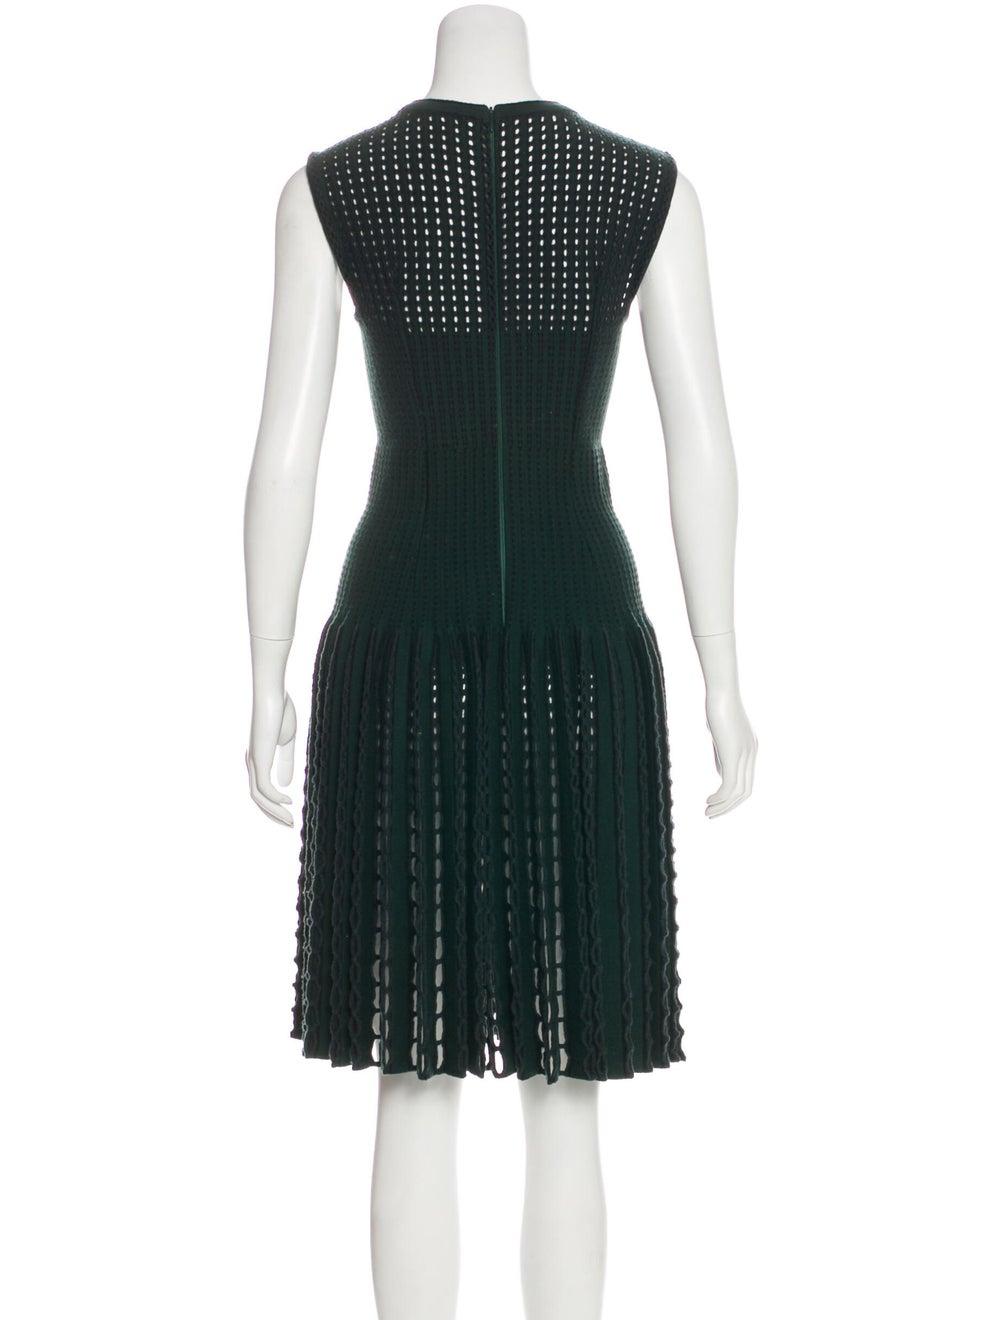 Alaïa Wool Open Knit Dress green - image 3